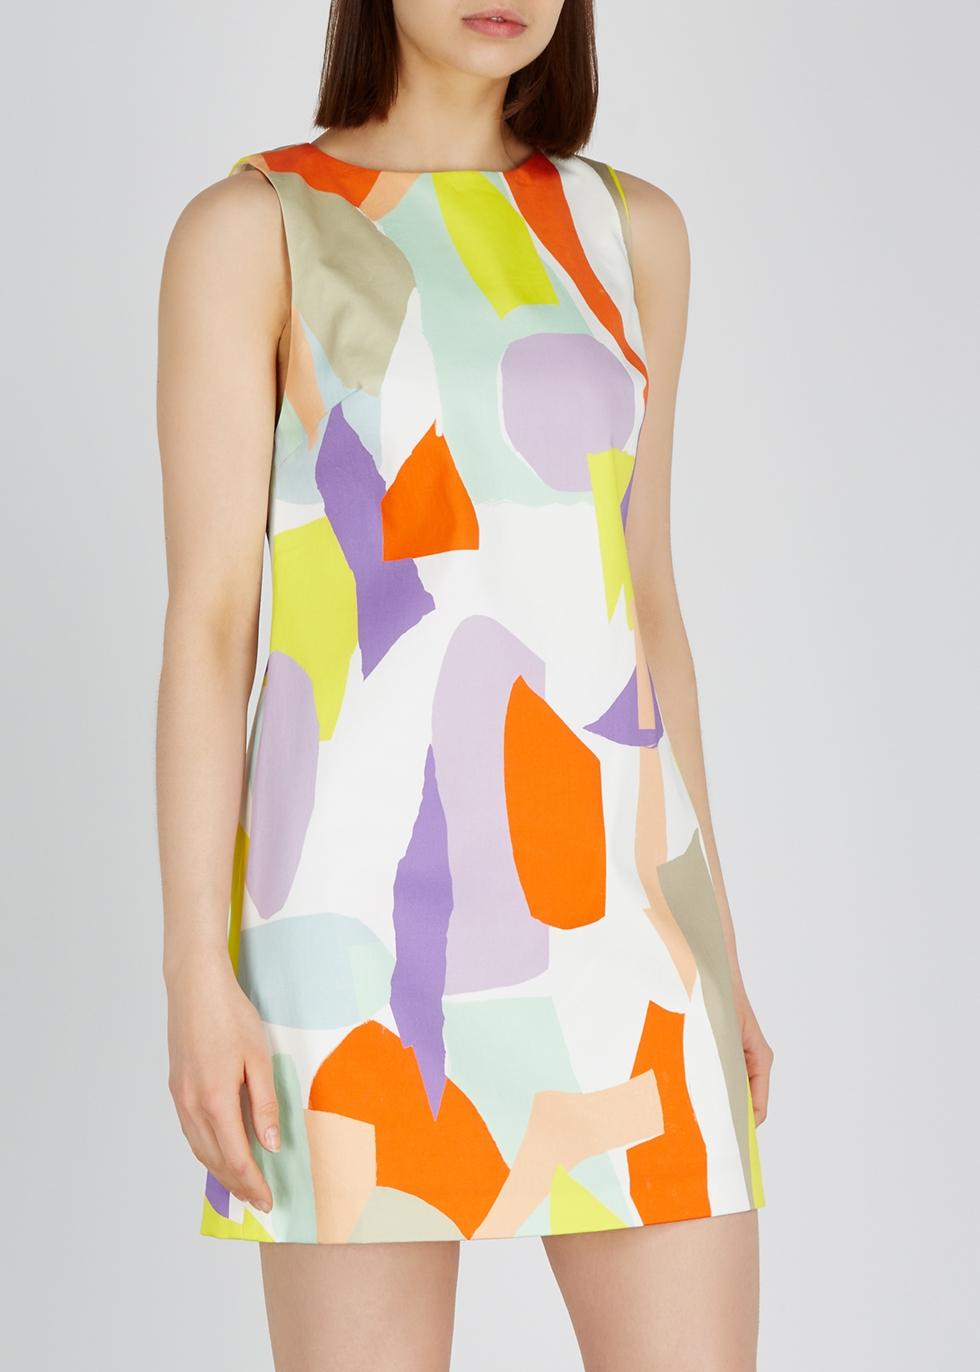 Clyde printed A-line mini dress - Alice + Olivia